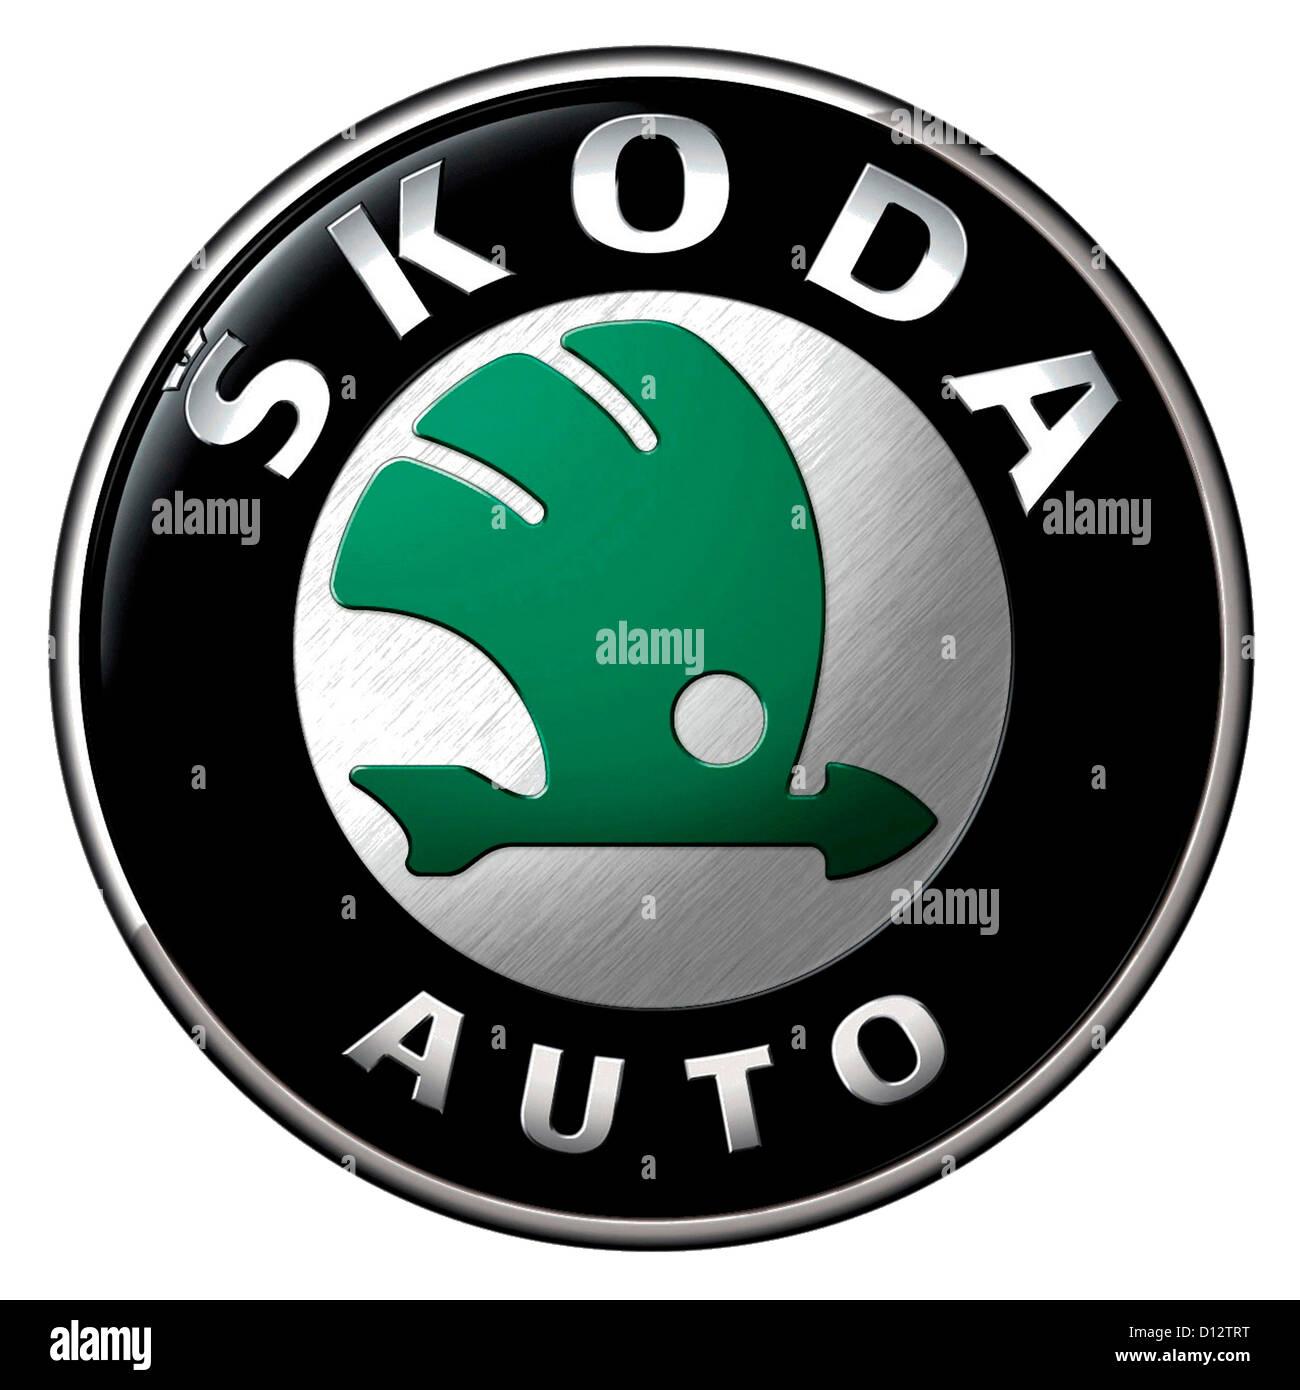 Company logo of the Czech automobile manufacturer Skoda with seat in Mlada Boleslav. - Stock Image